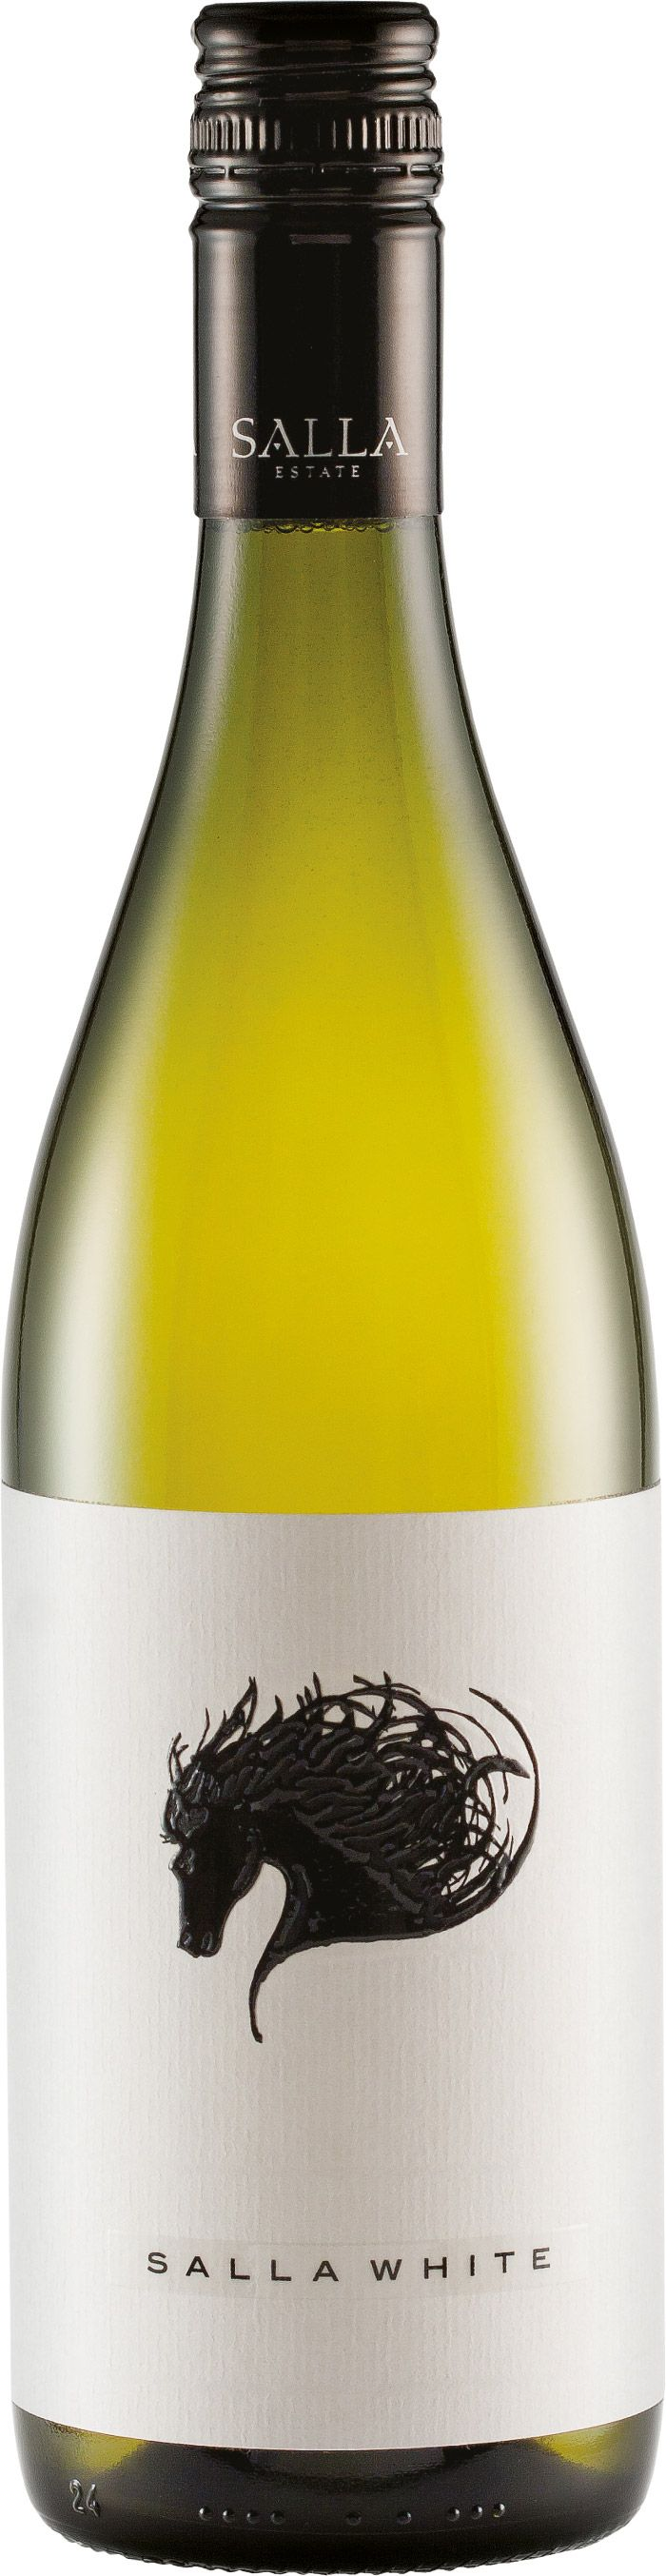 24_04_2012_sallawhite_labelmaker_-(4).jpgWine Labels Lov, Salla White, White Wines, Design Packaging Products, Wine Packaging, Sallawhite 003, Wine Design, Packaging Design, Labels Design